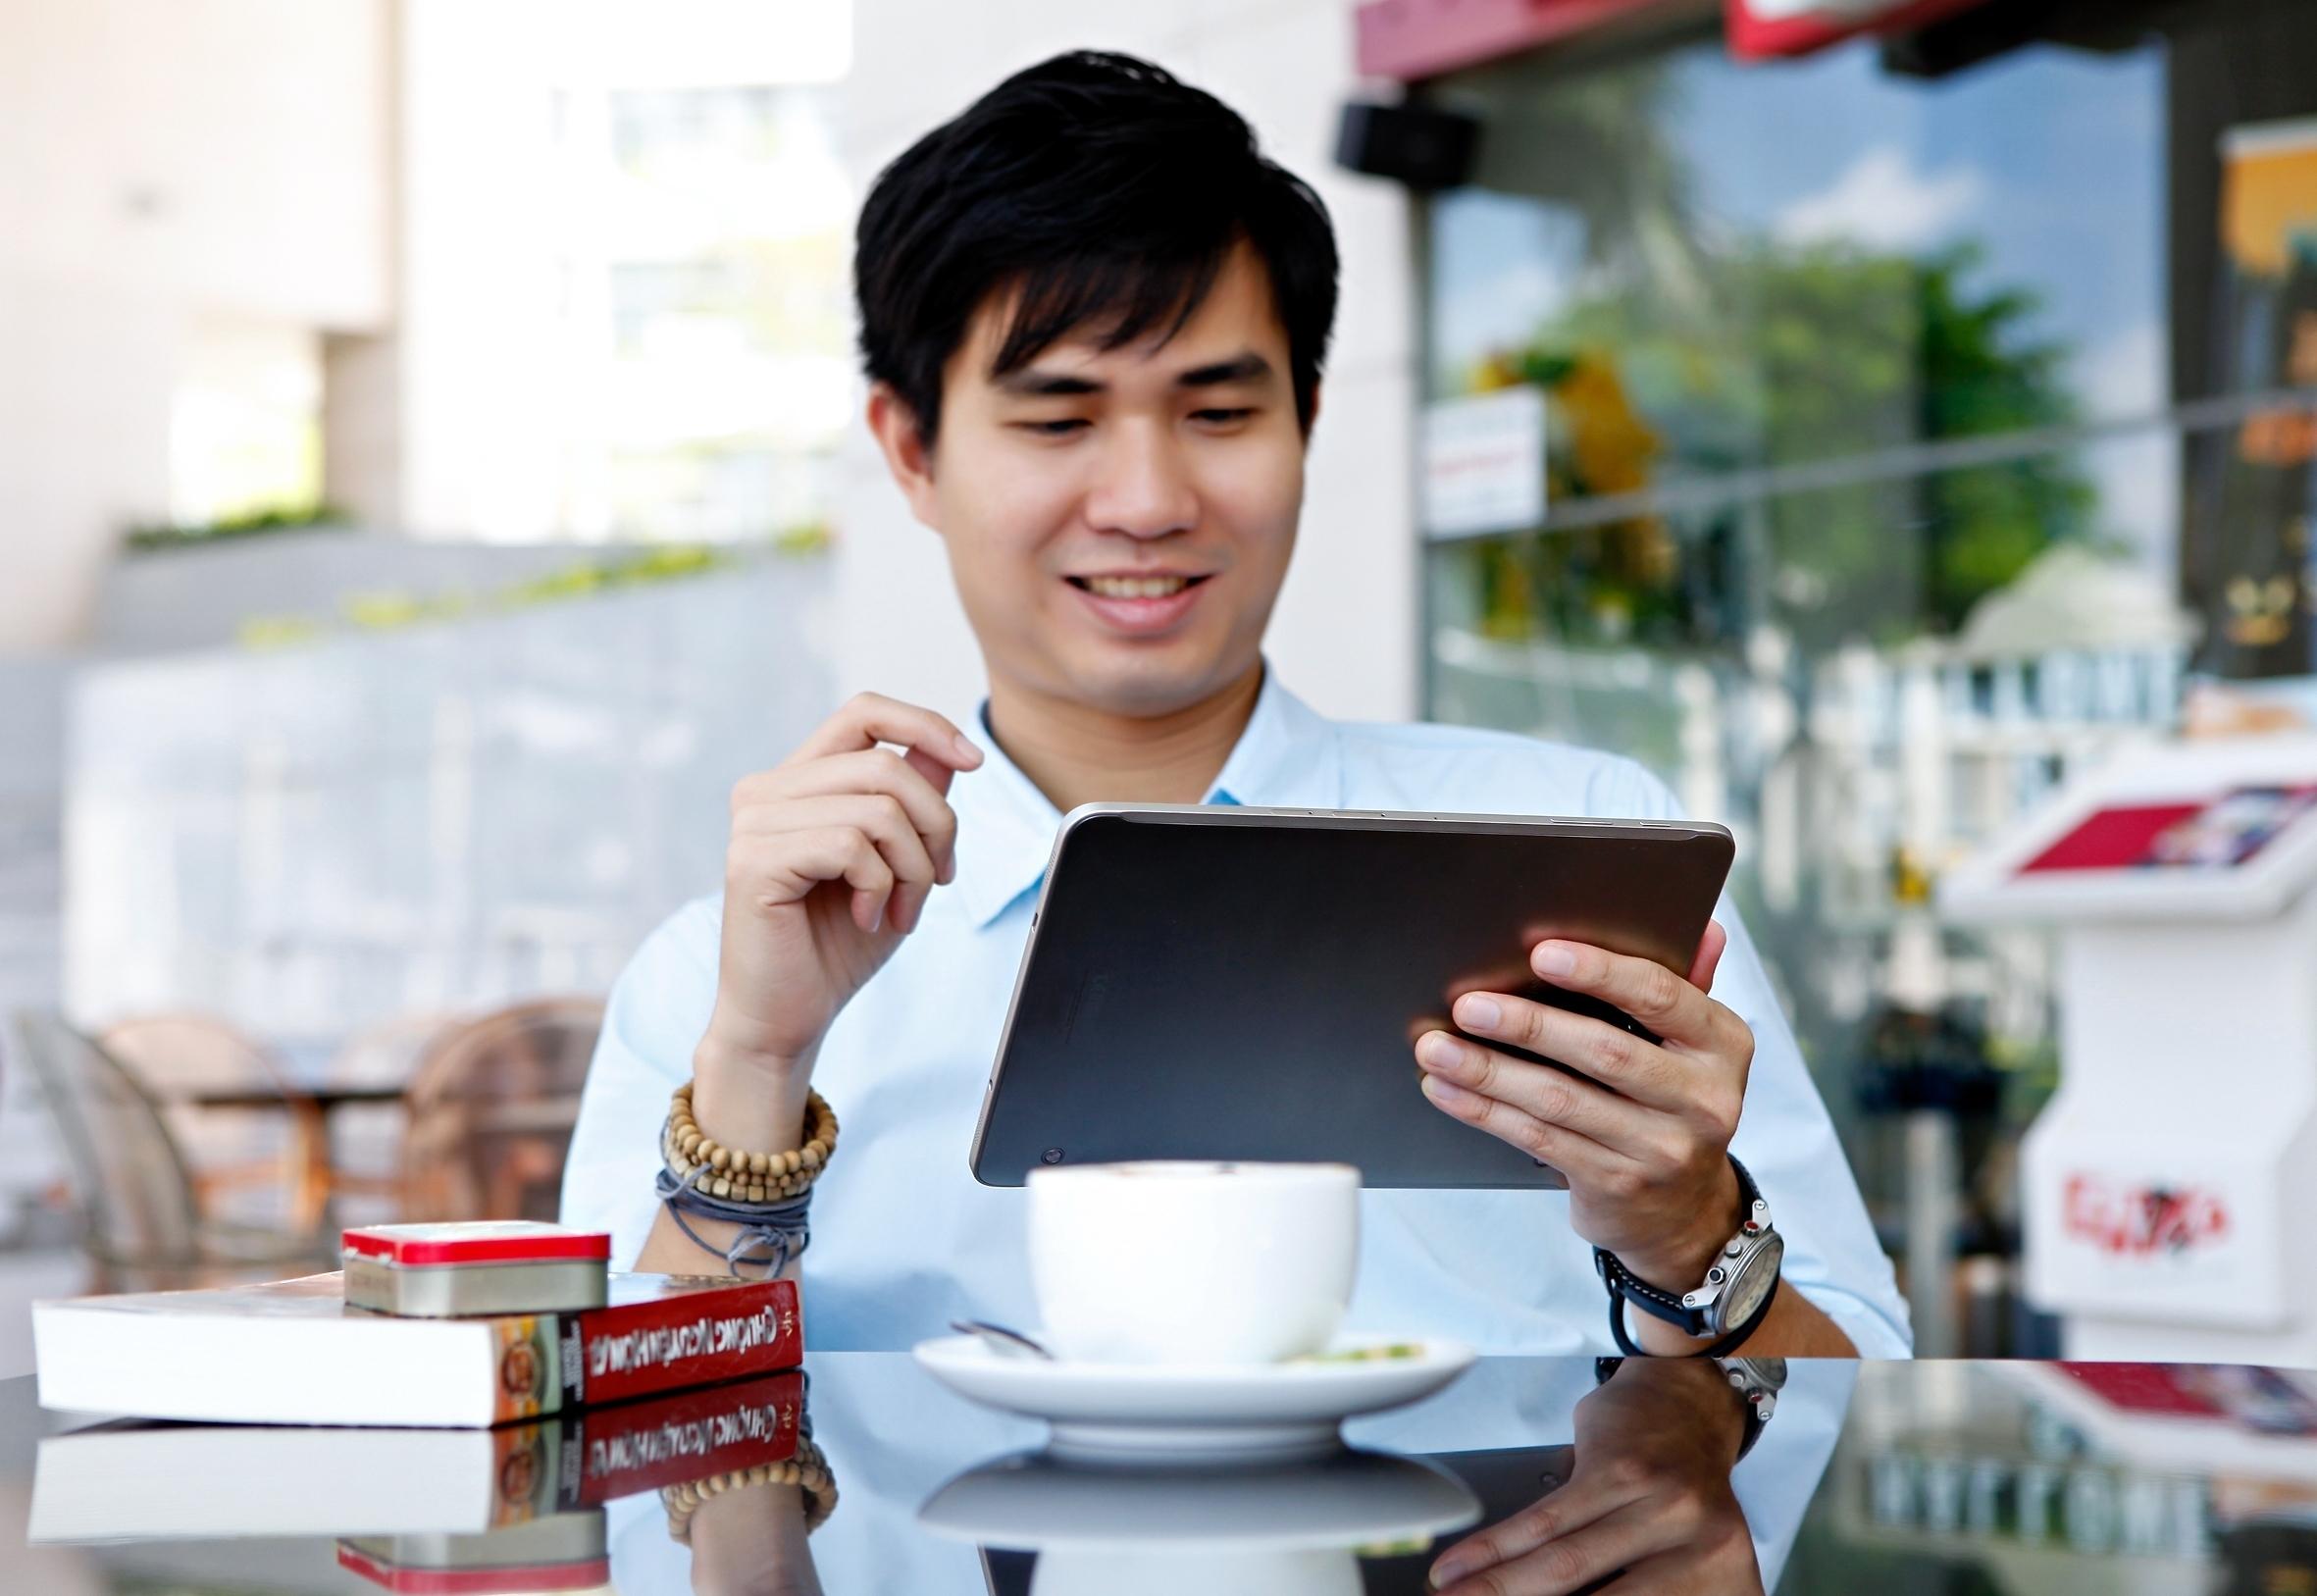 Samsung Galaxy Tab S2 giải trí hay đọc tin tức đều phù hợp